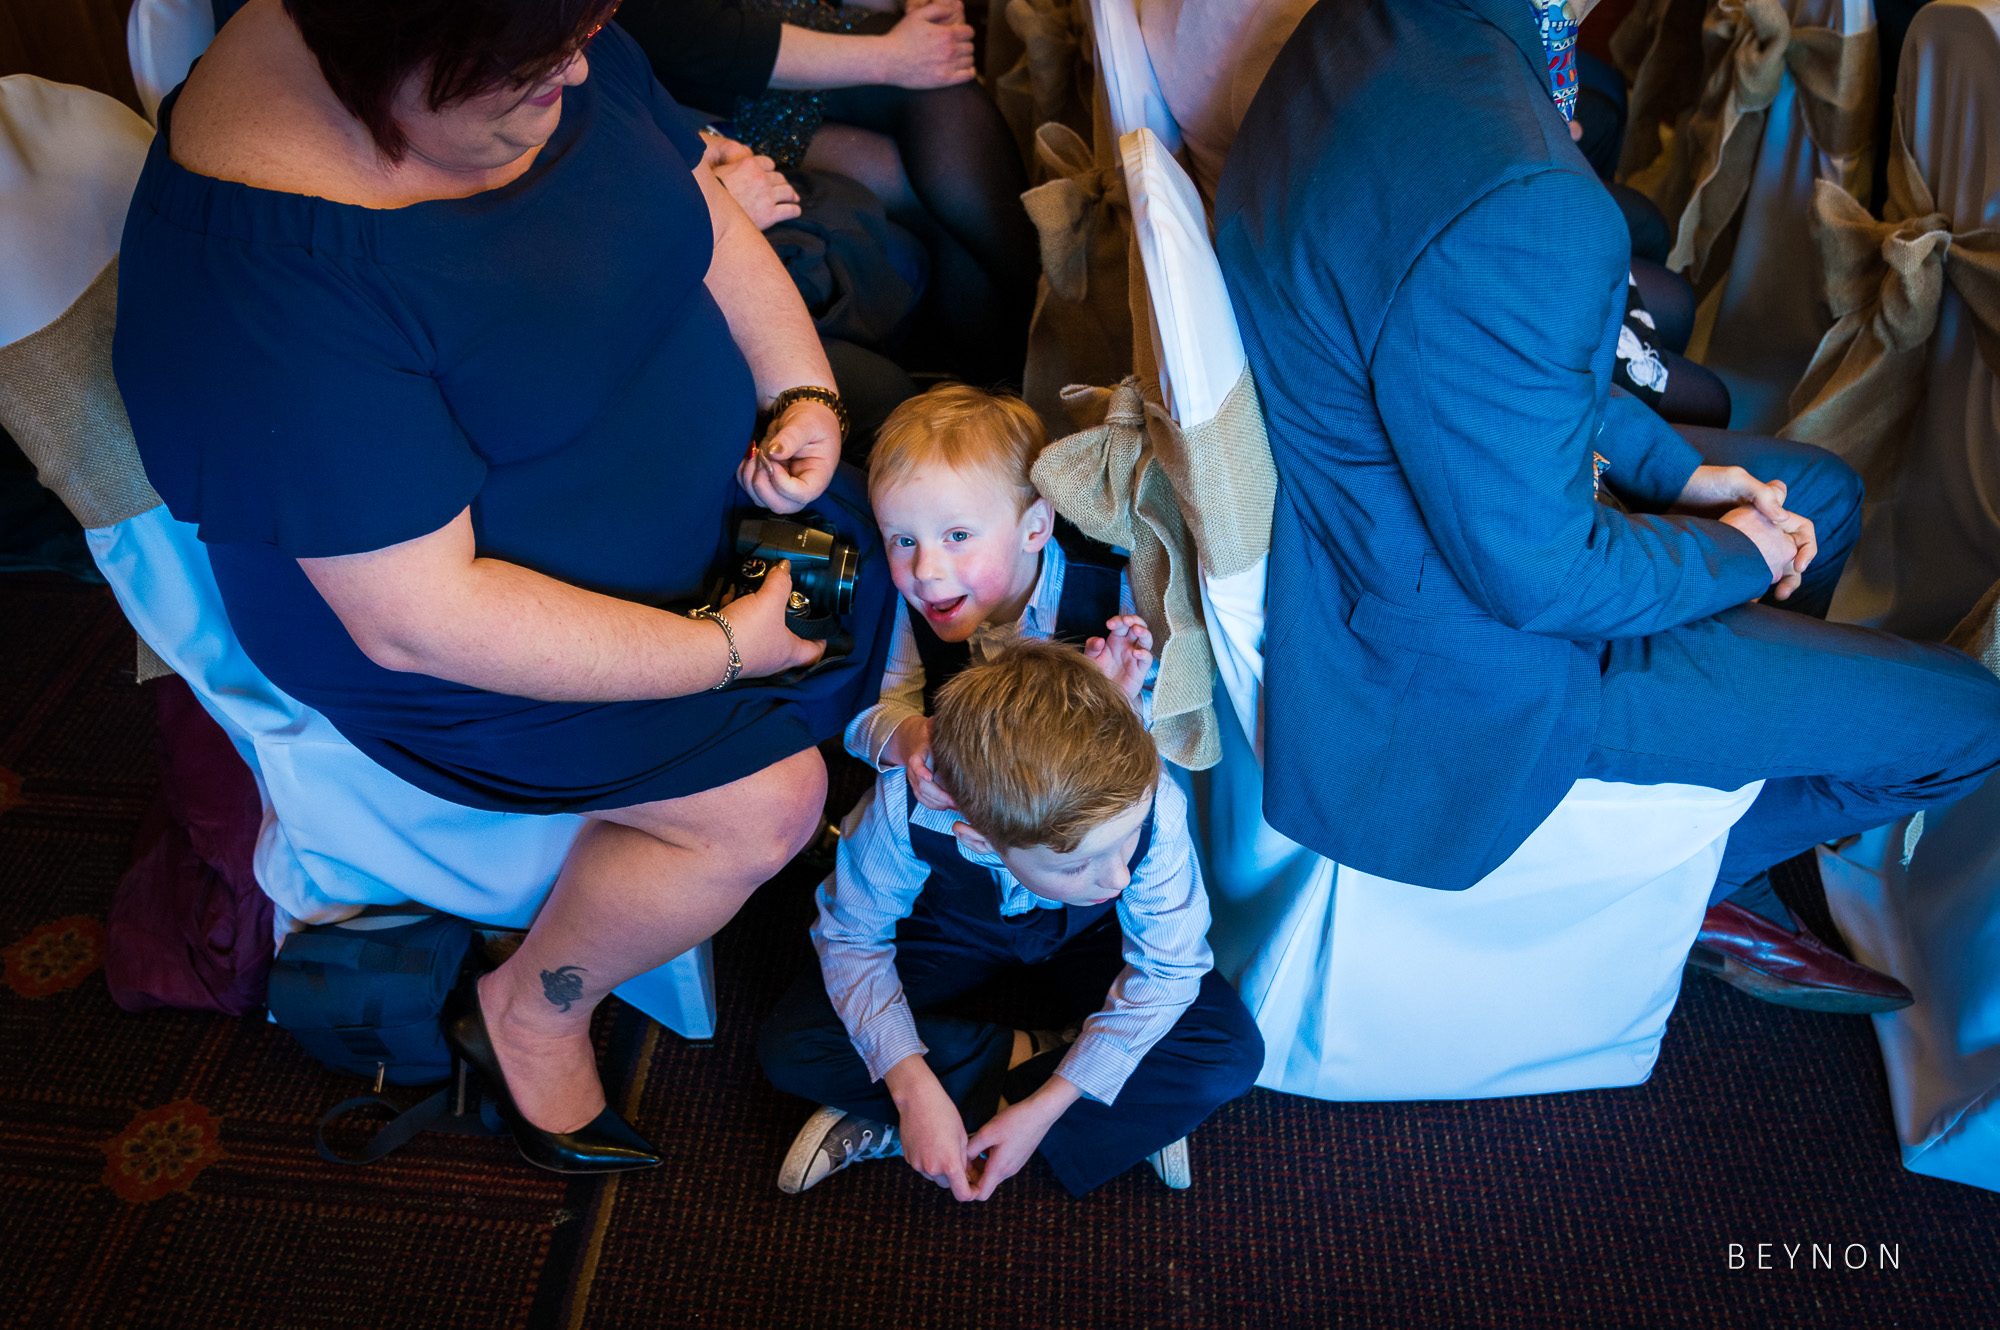 Children sitting on the floor